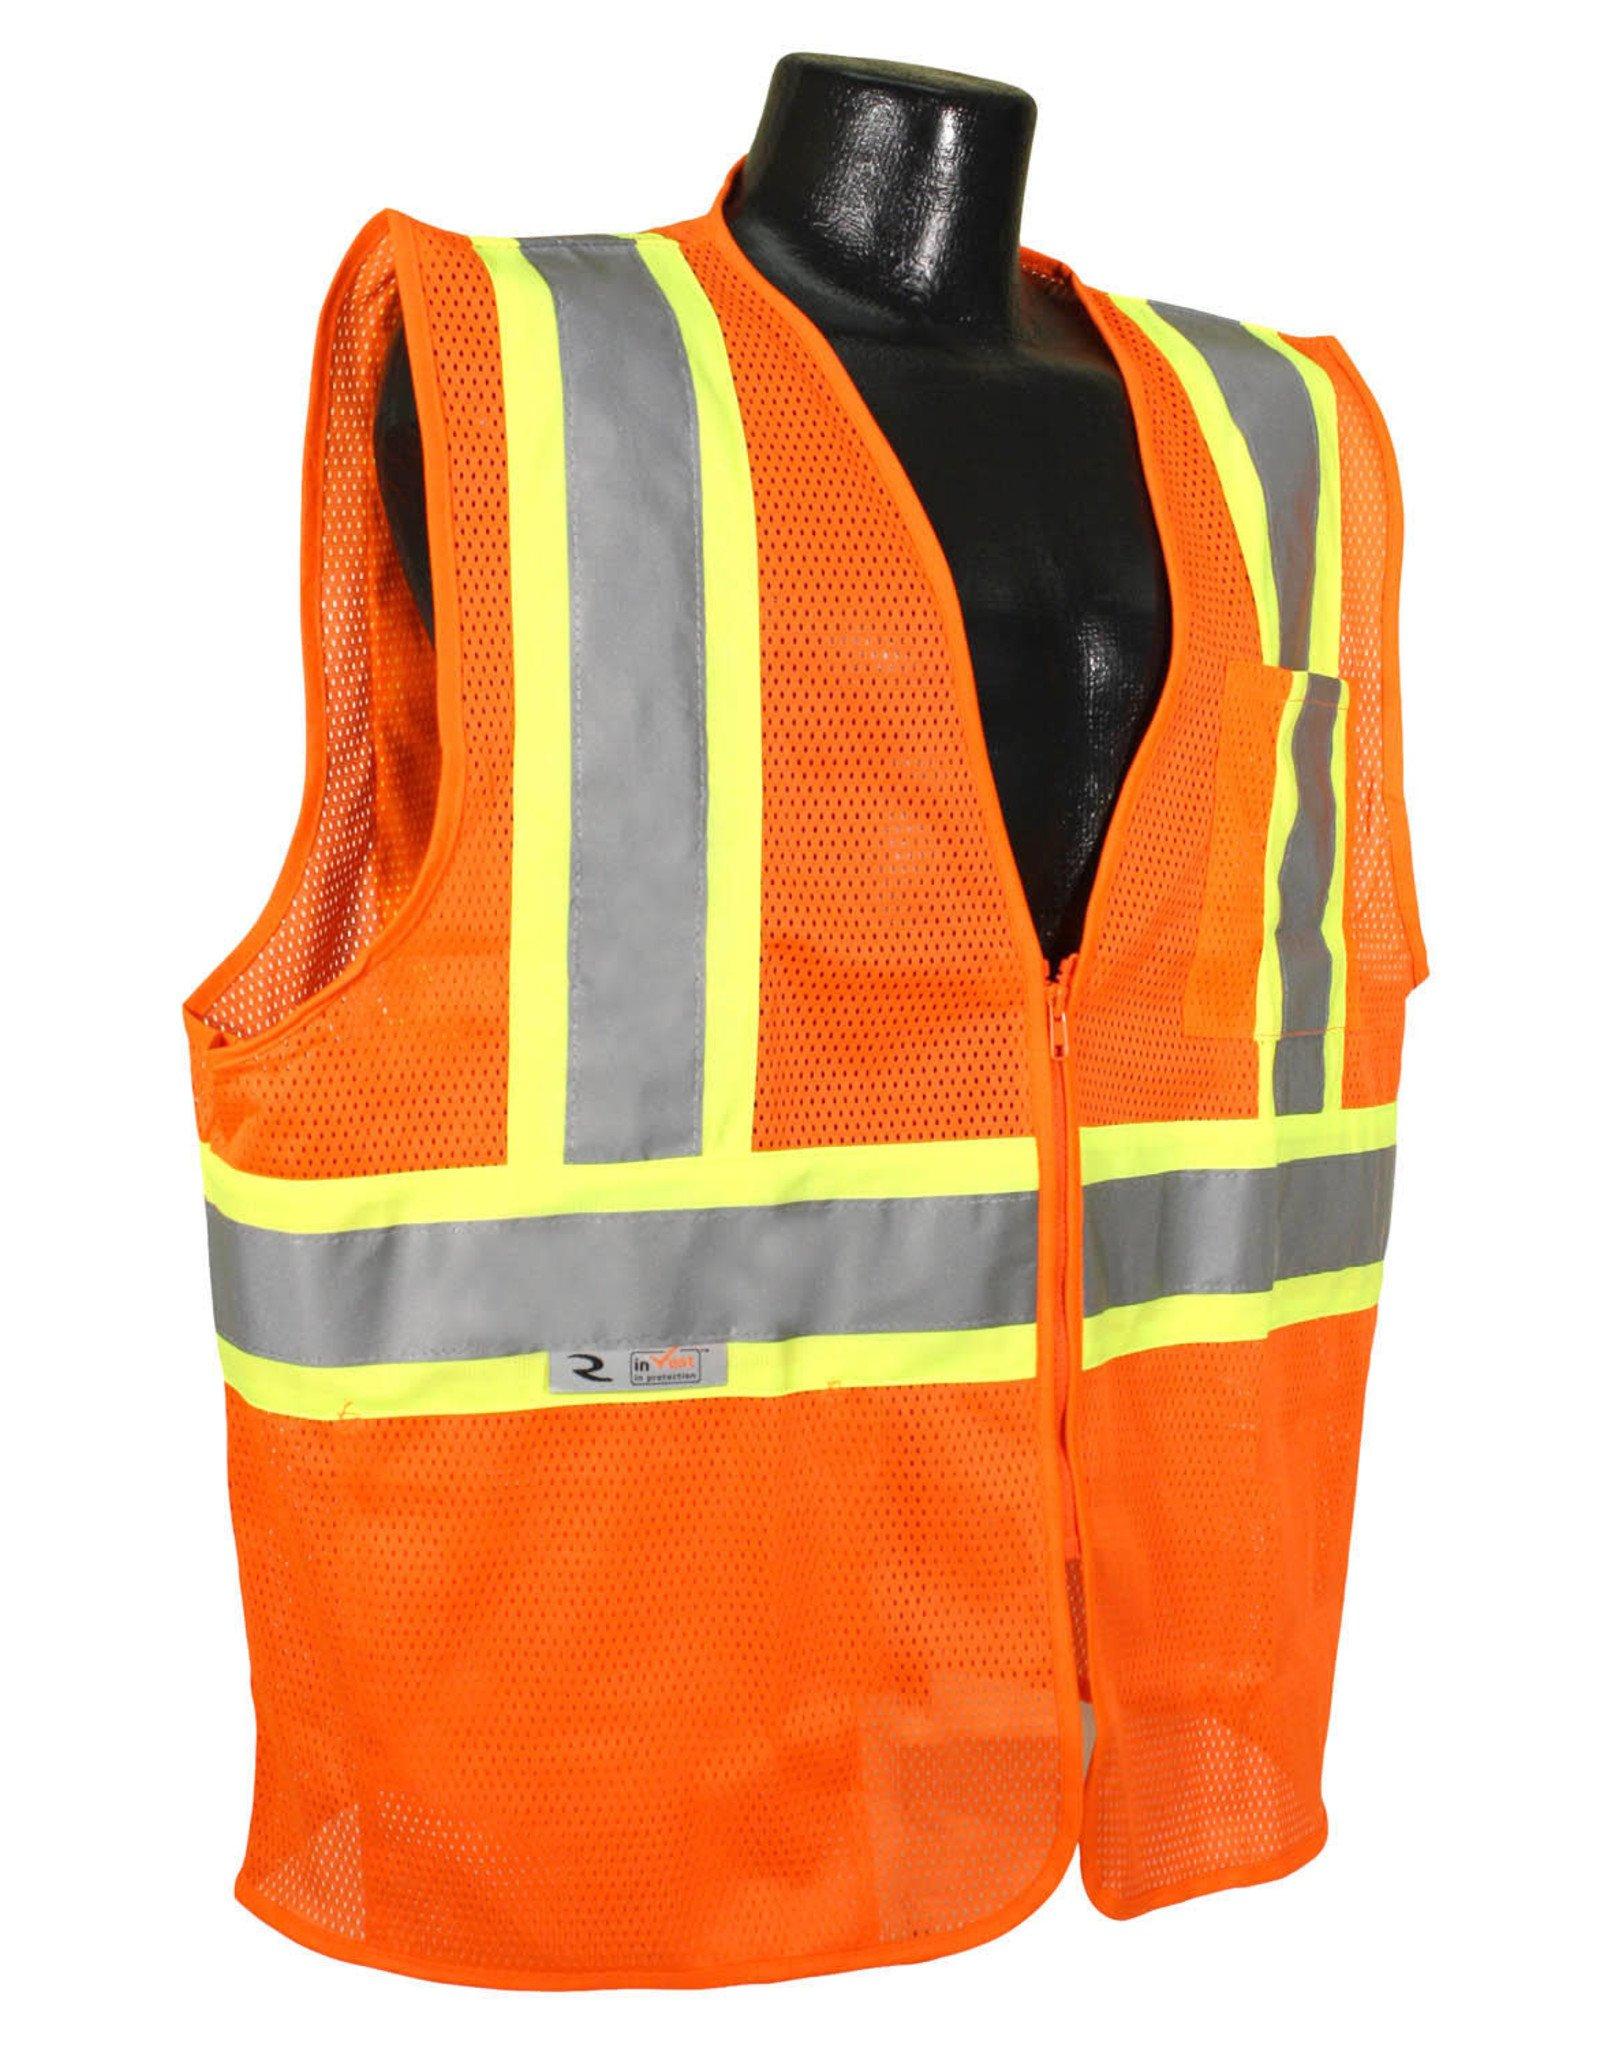 Case of 50 - Safety Vests, Orange Mesh Class II, Reflective Tape, SZ. M - 4XL